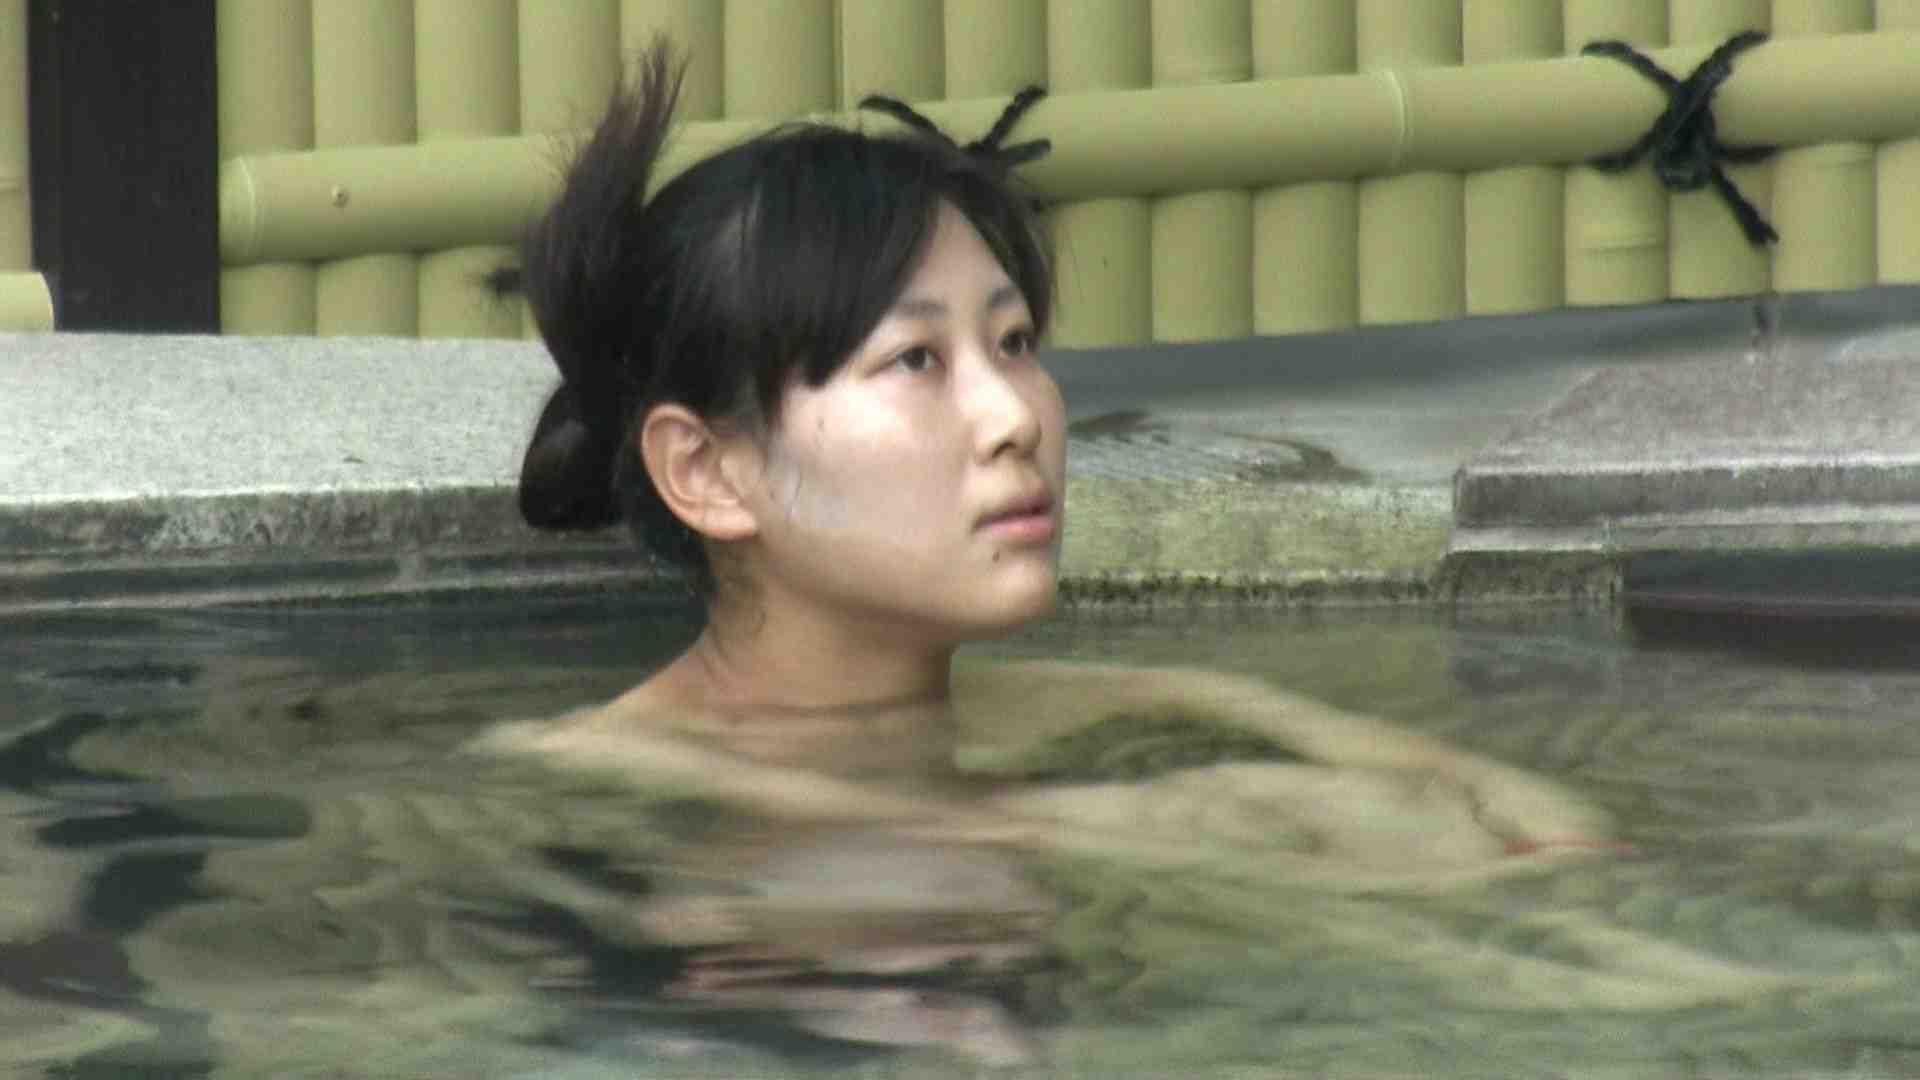 Aquaな露天風呂Vol.665 HなOL   盗撮  104pic 35